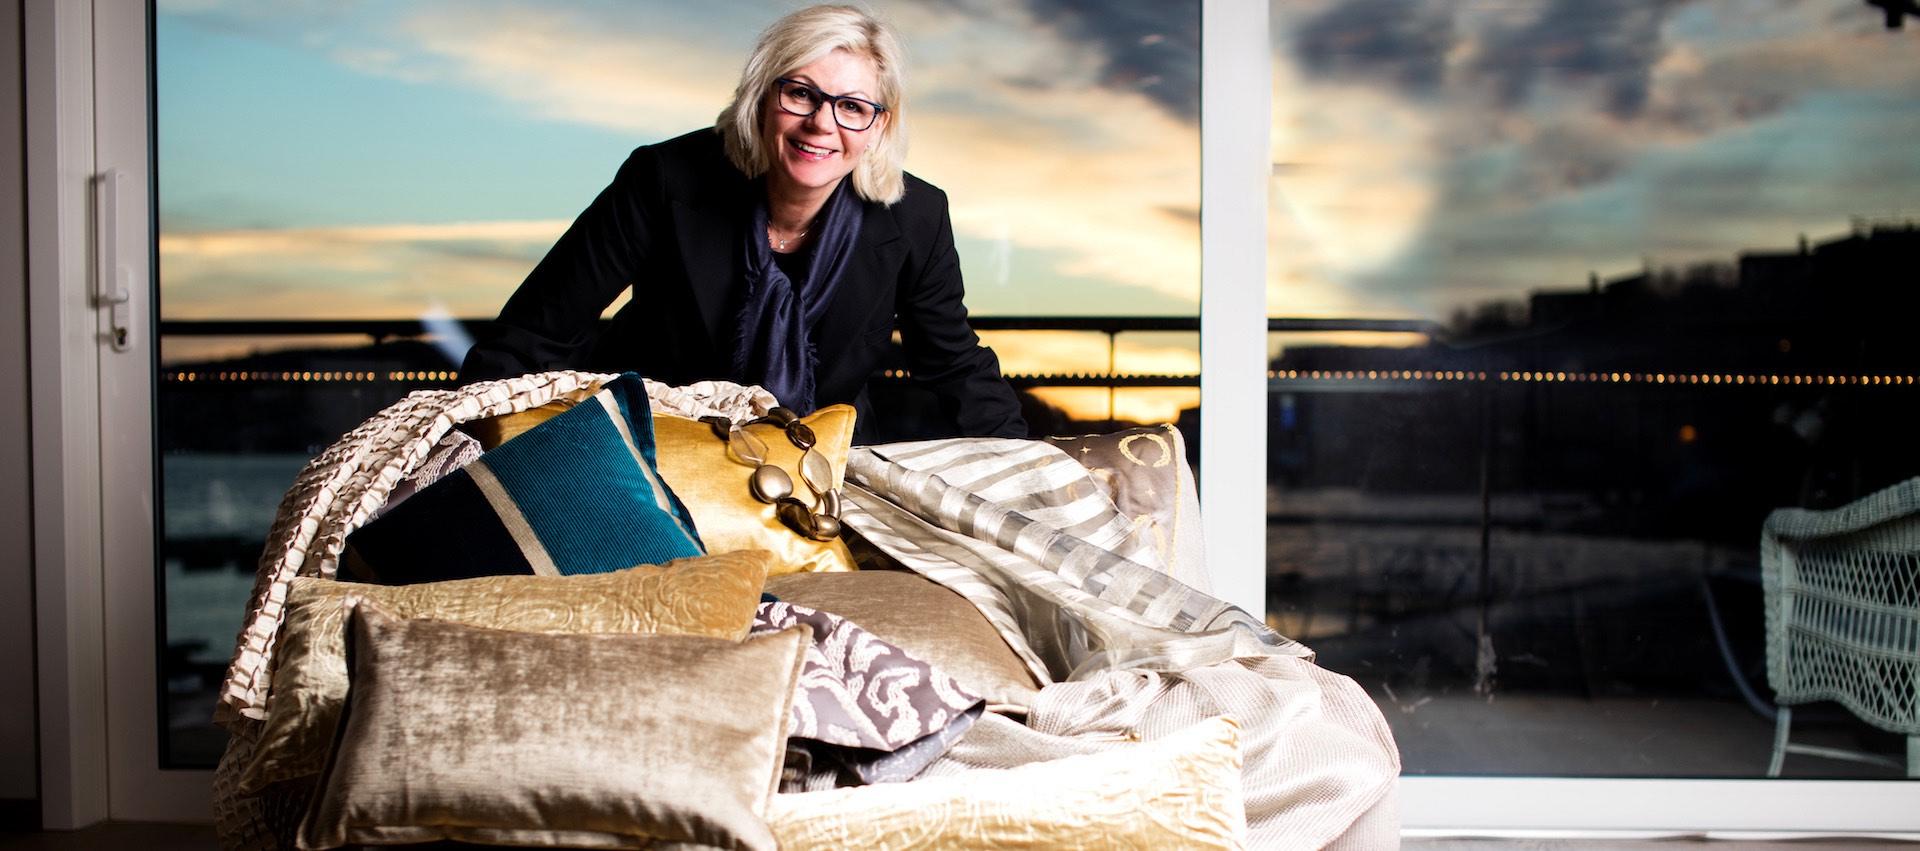 Gardinexperten Siri Christine Sandberg, Arendal. Puter og tekstiler